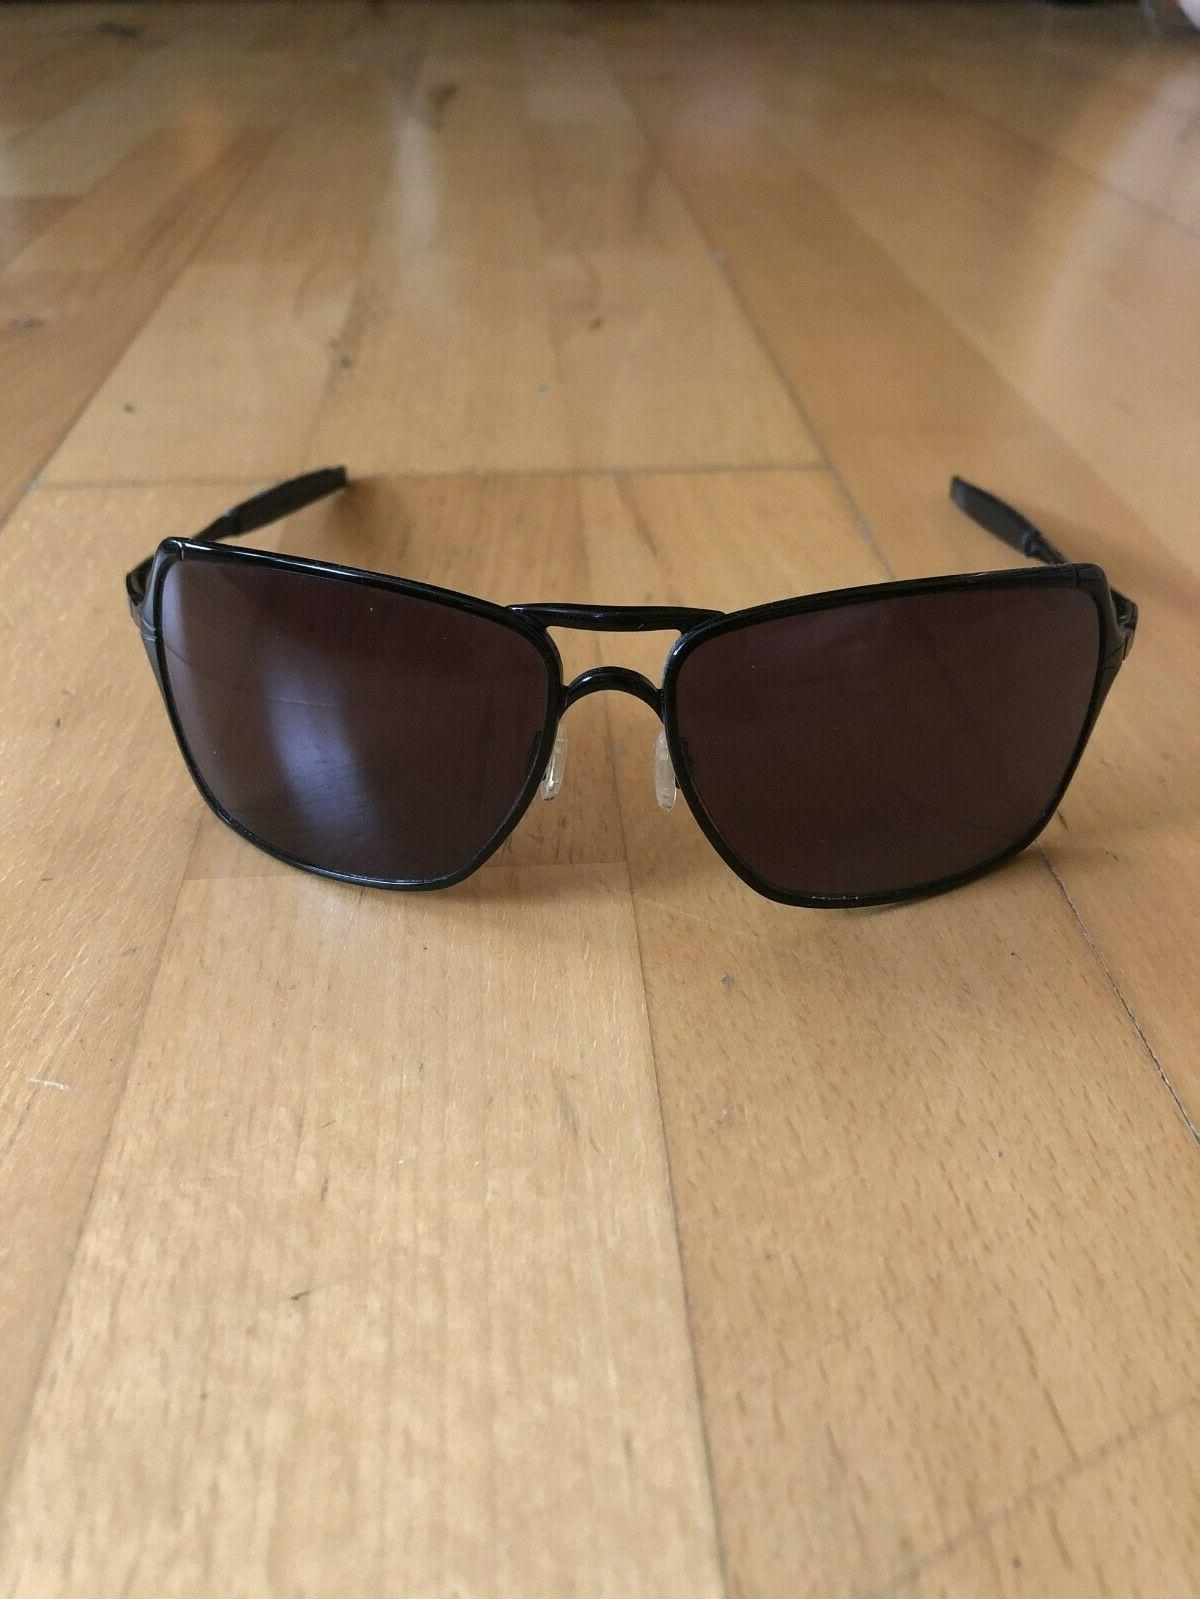 sunglasses inmate black frame iridium black lens